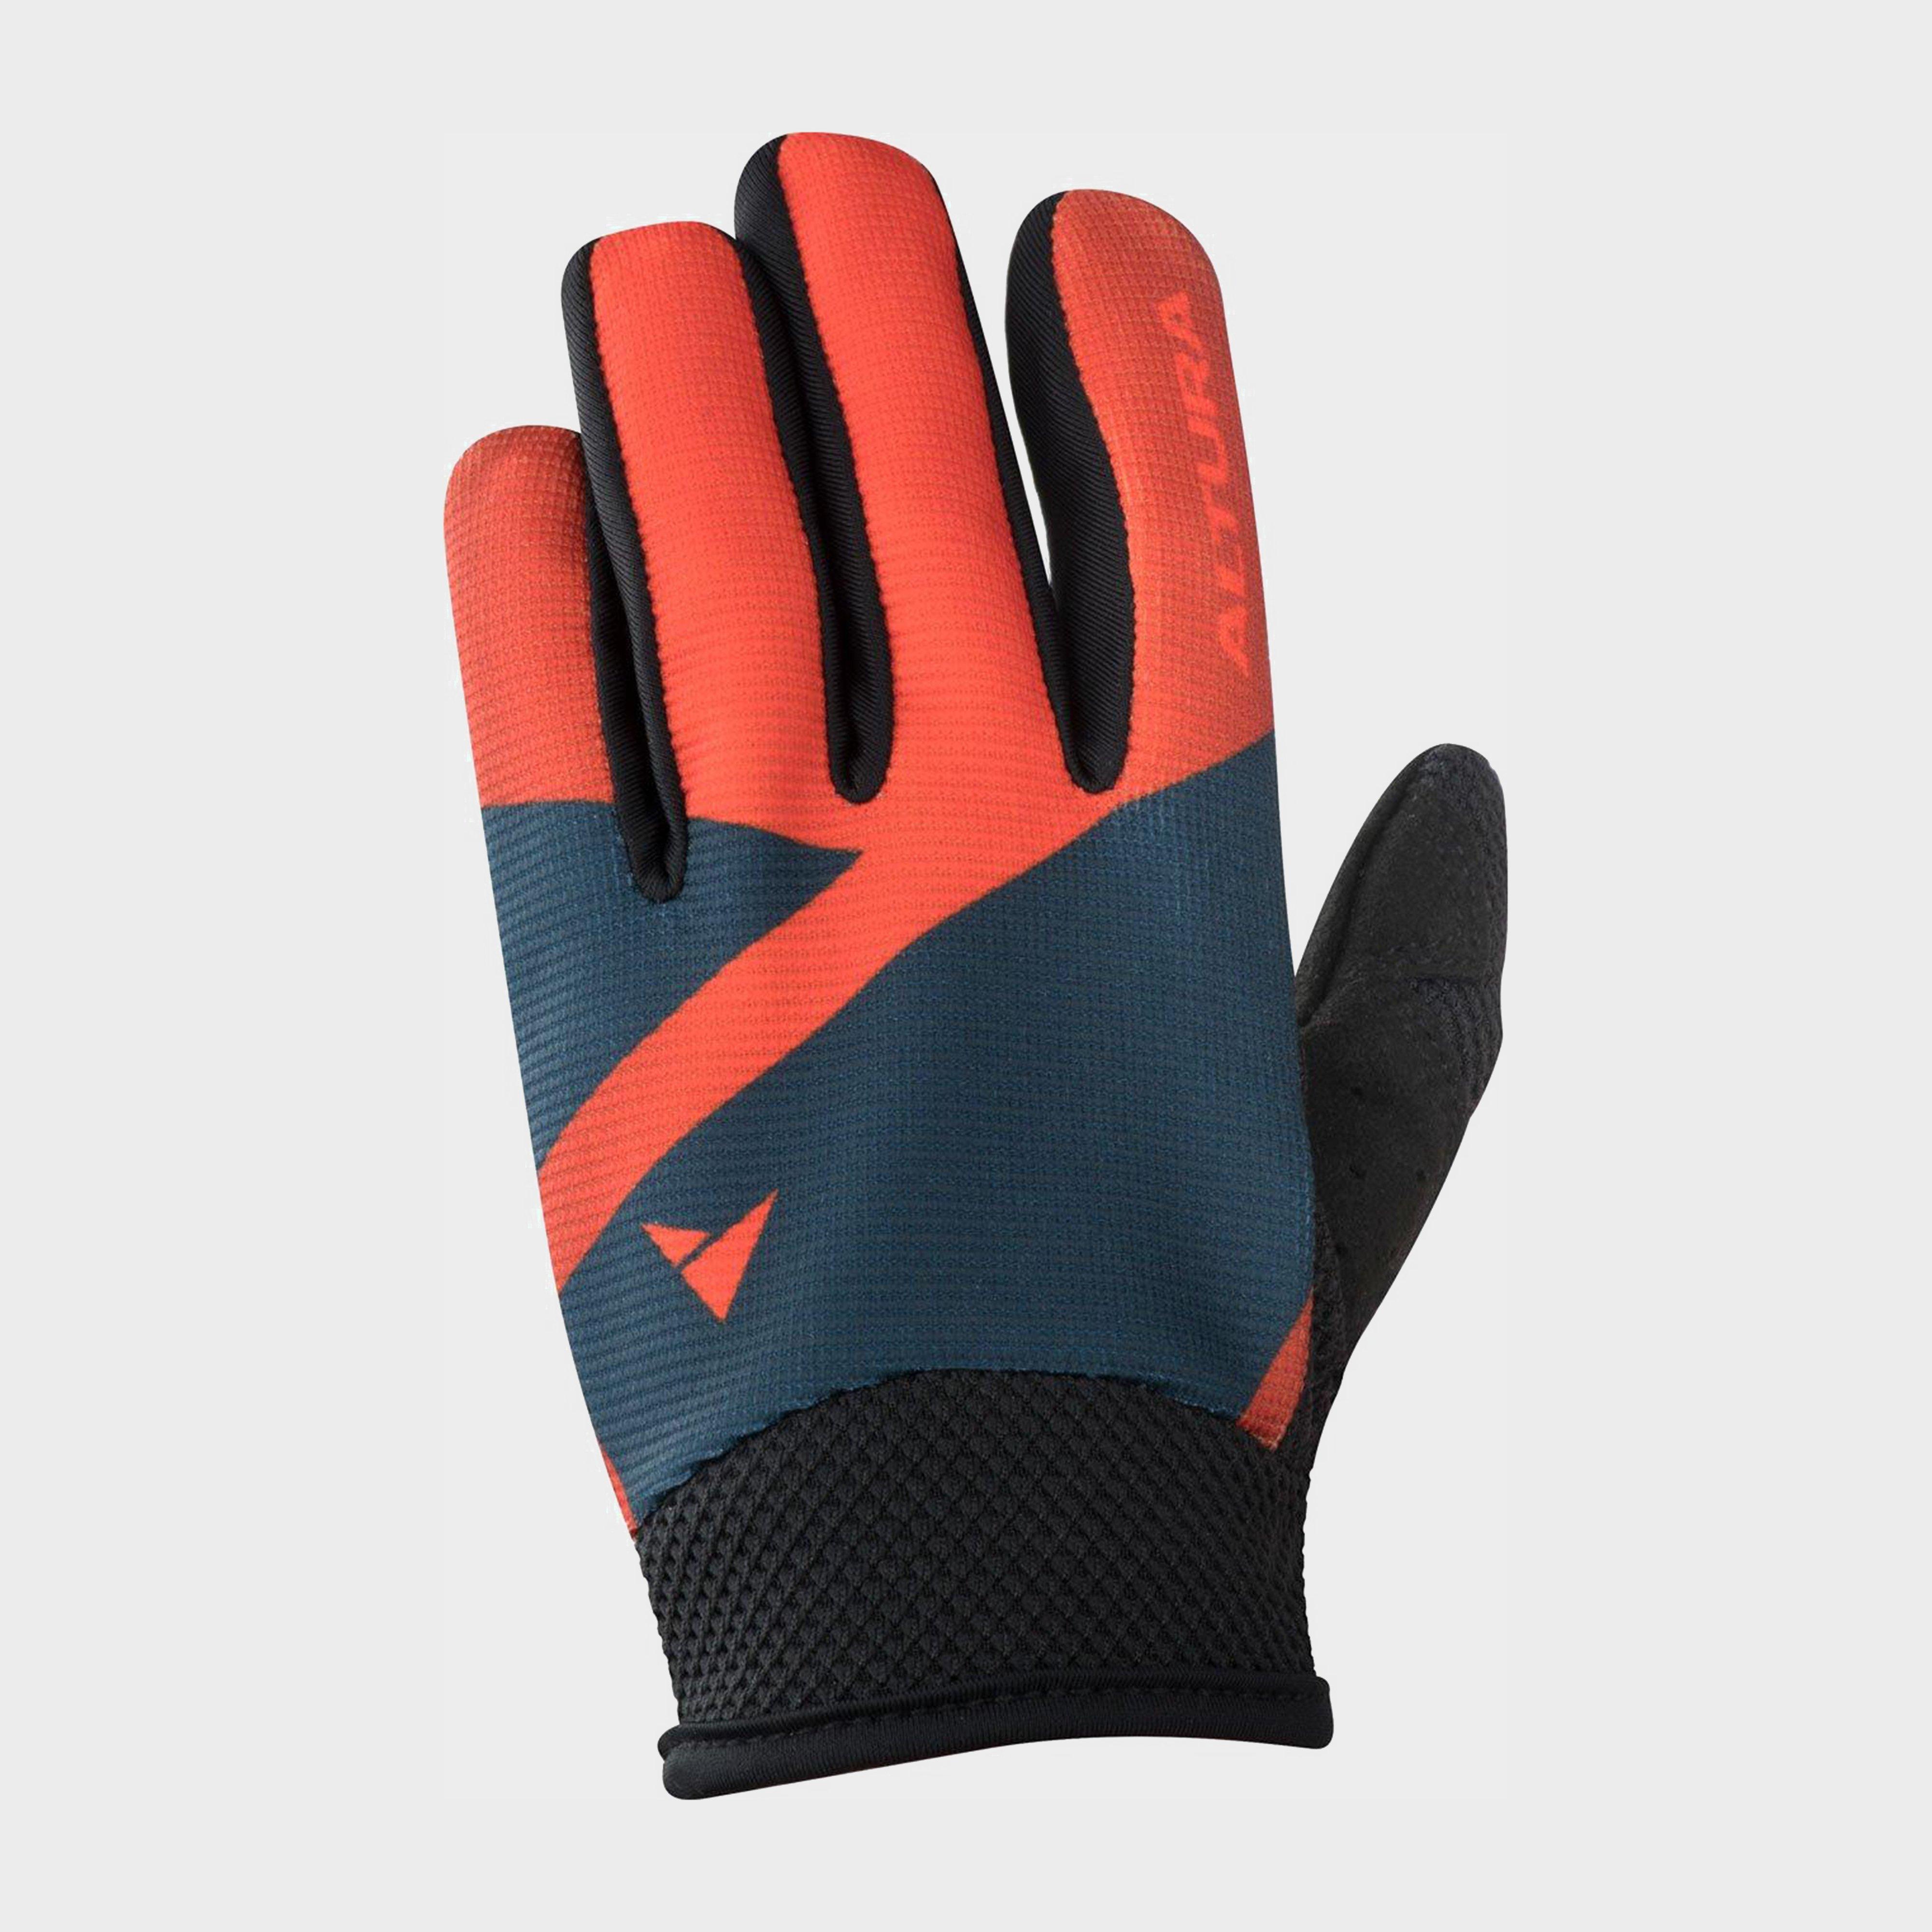 Altura Spark Kids Cycling Gloves